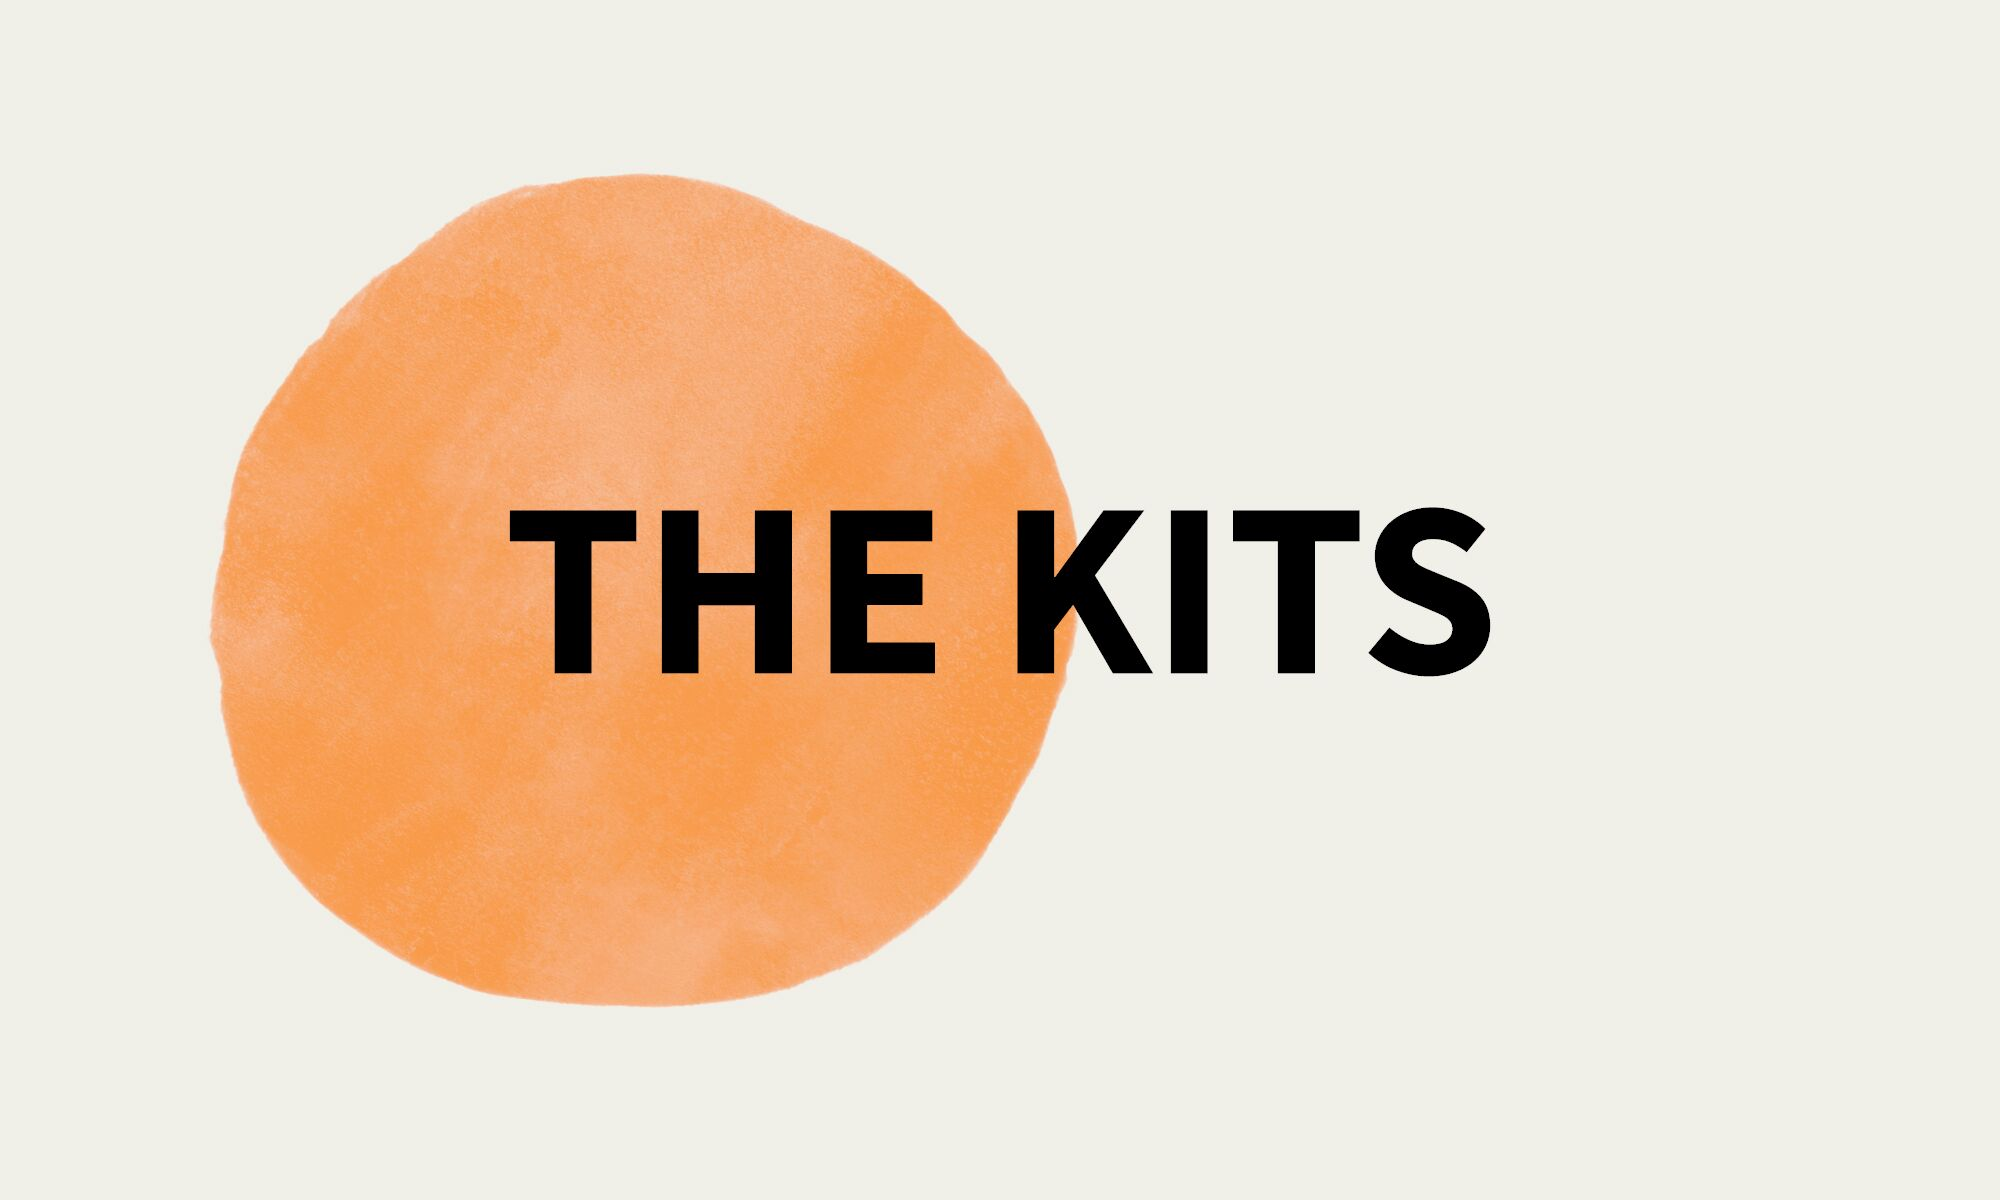 THE KITS_lockup_text_rect.jpg